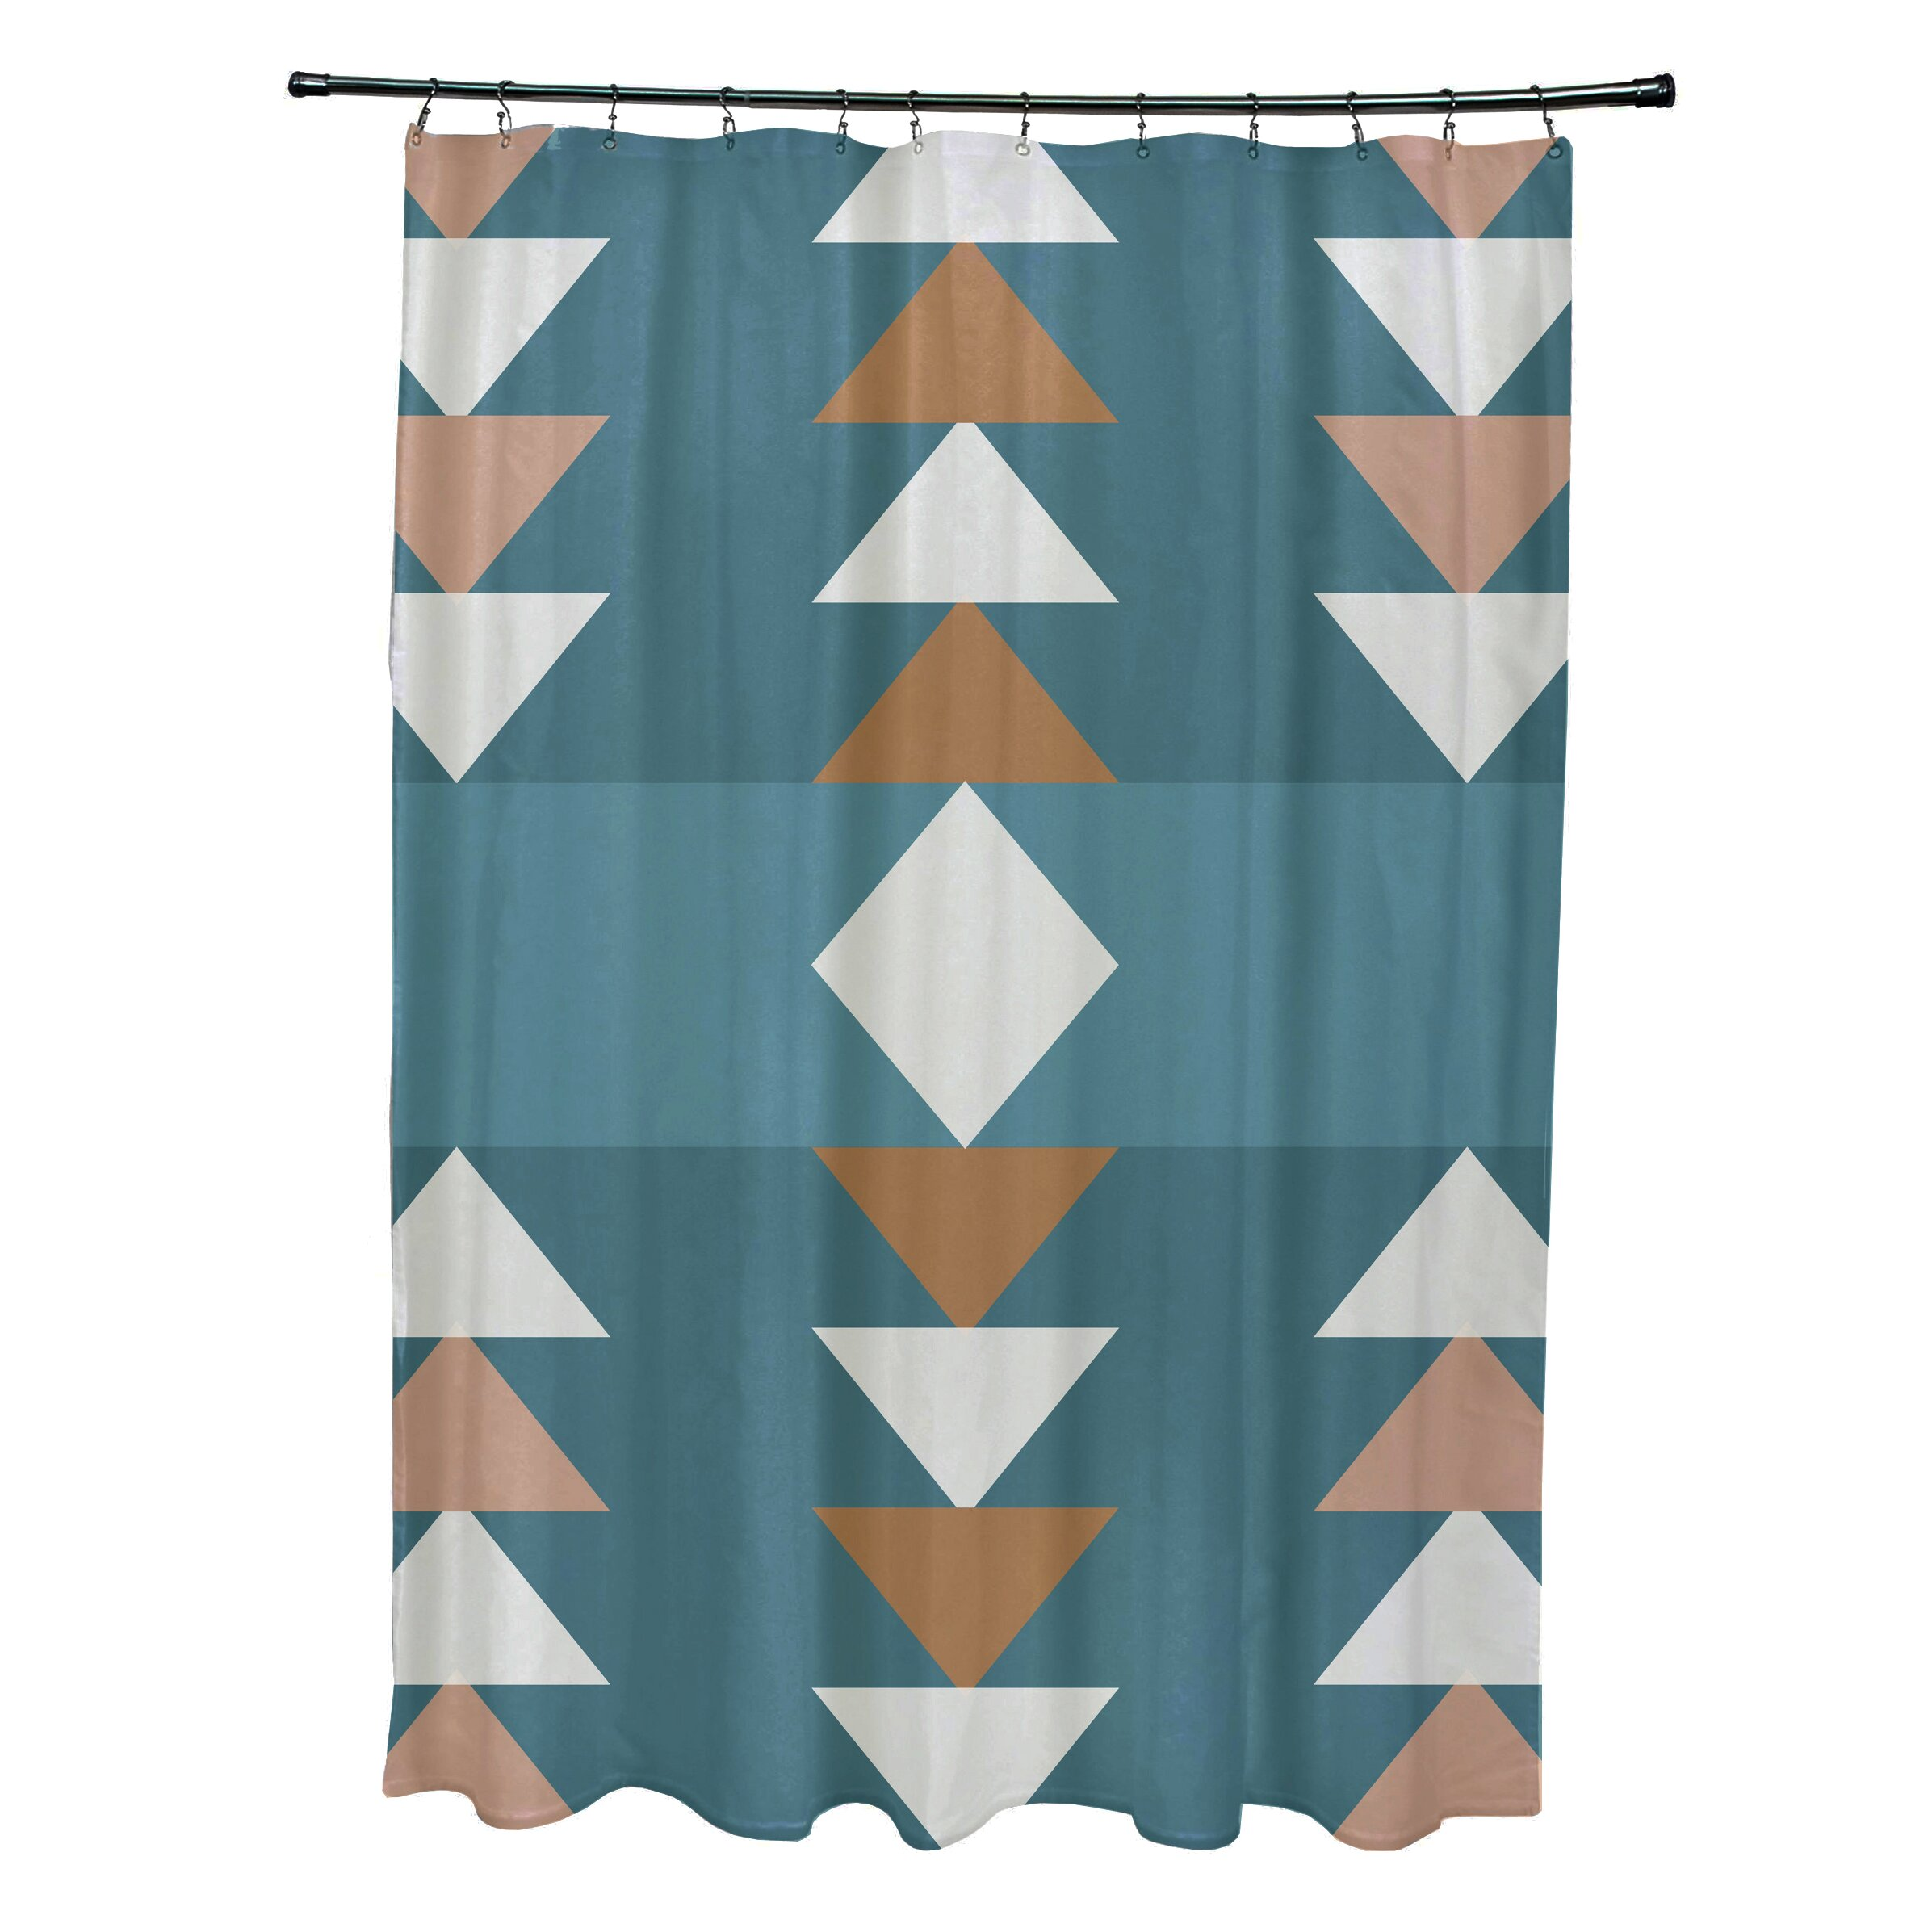 Geometric Print Shower Curtain Latest This Item Dots Print Eva Shower Curtain Liner Water And